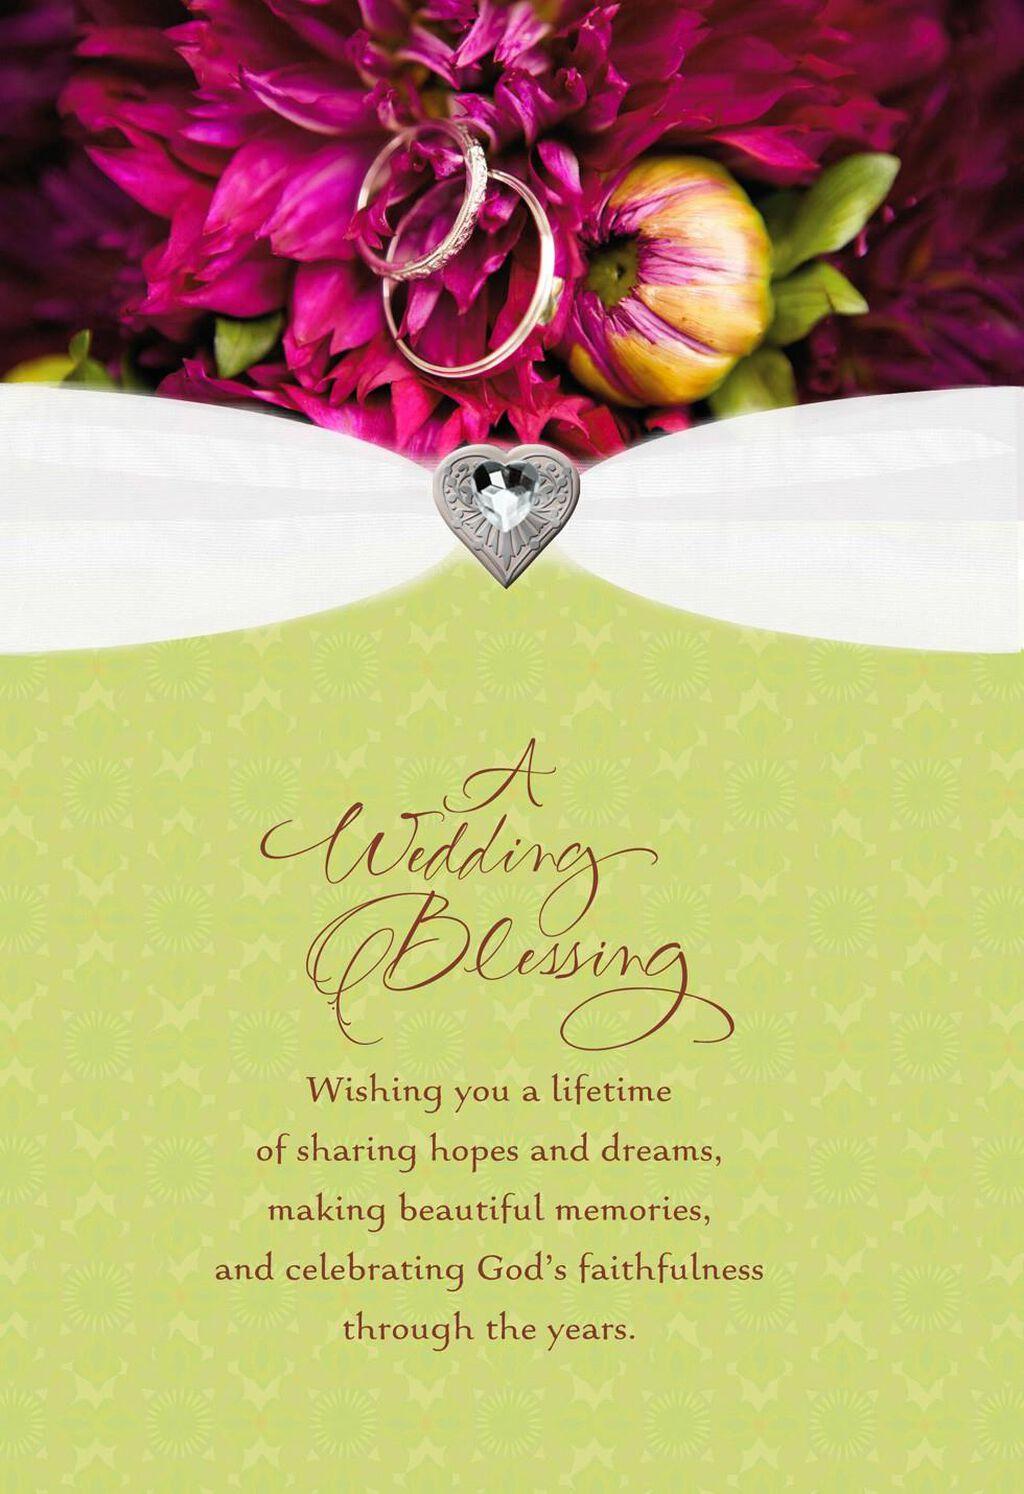 Wedding Blessing Religious Wedding Card Greeting Cards Hallmark